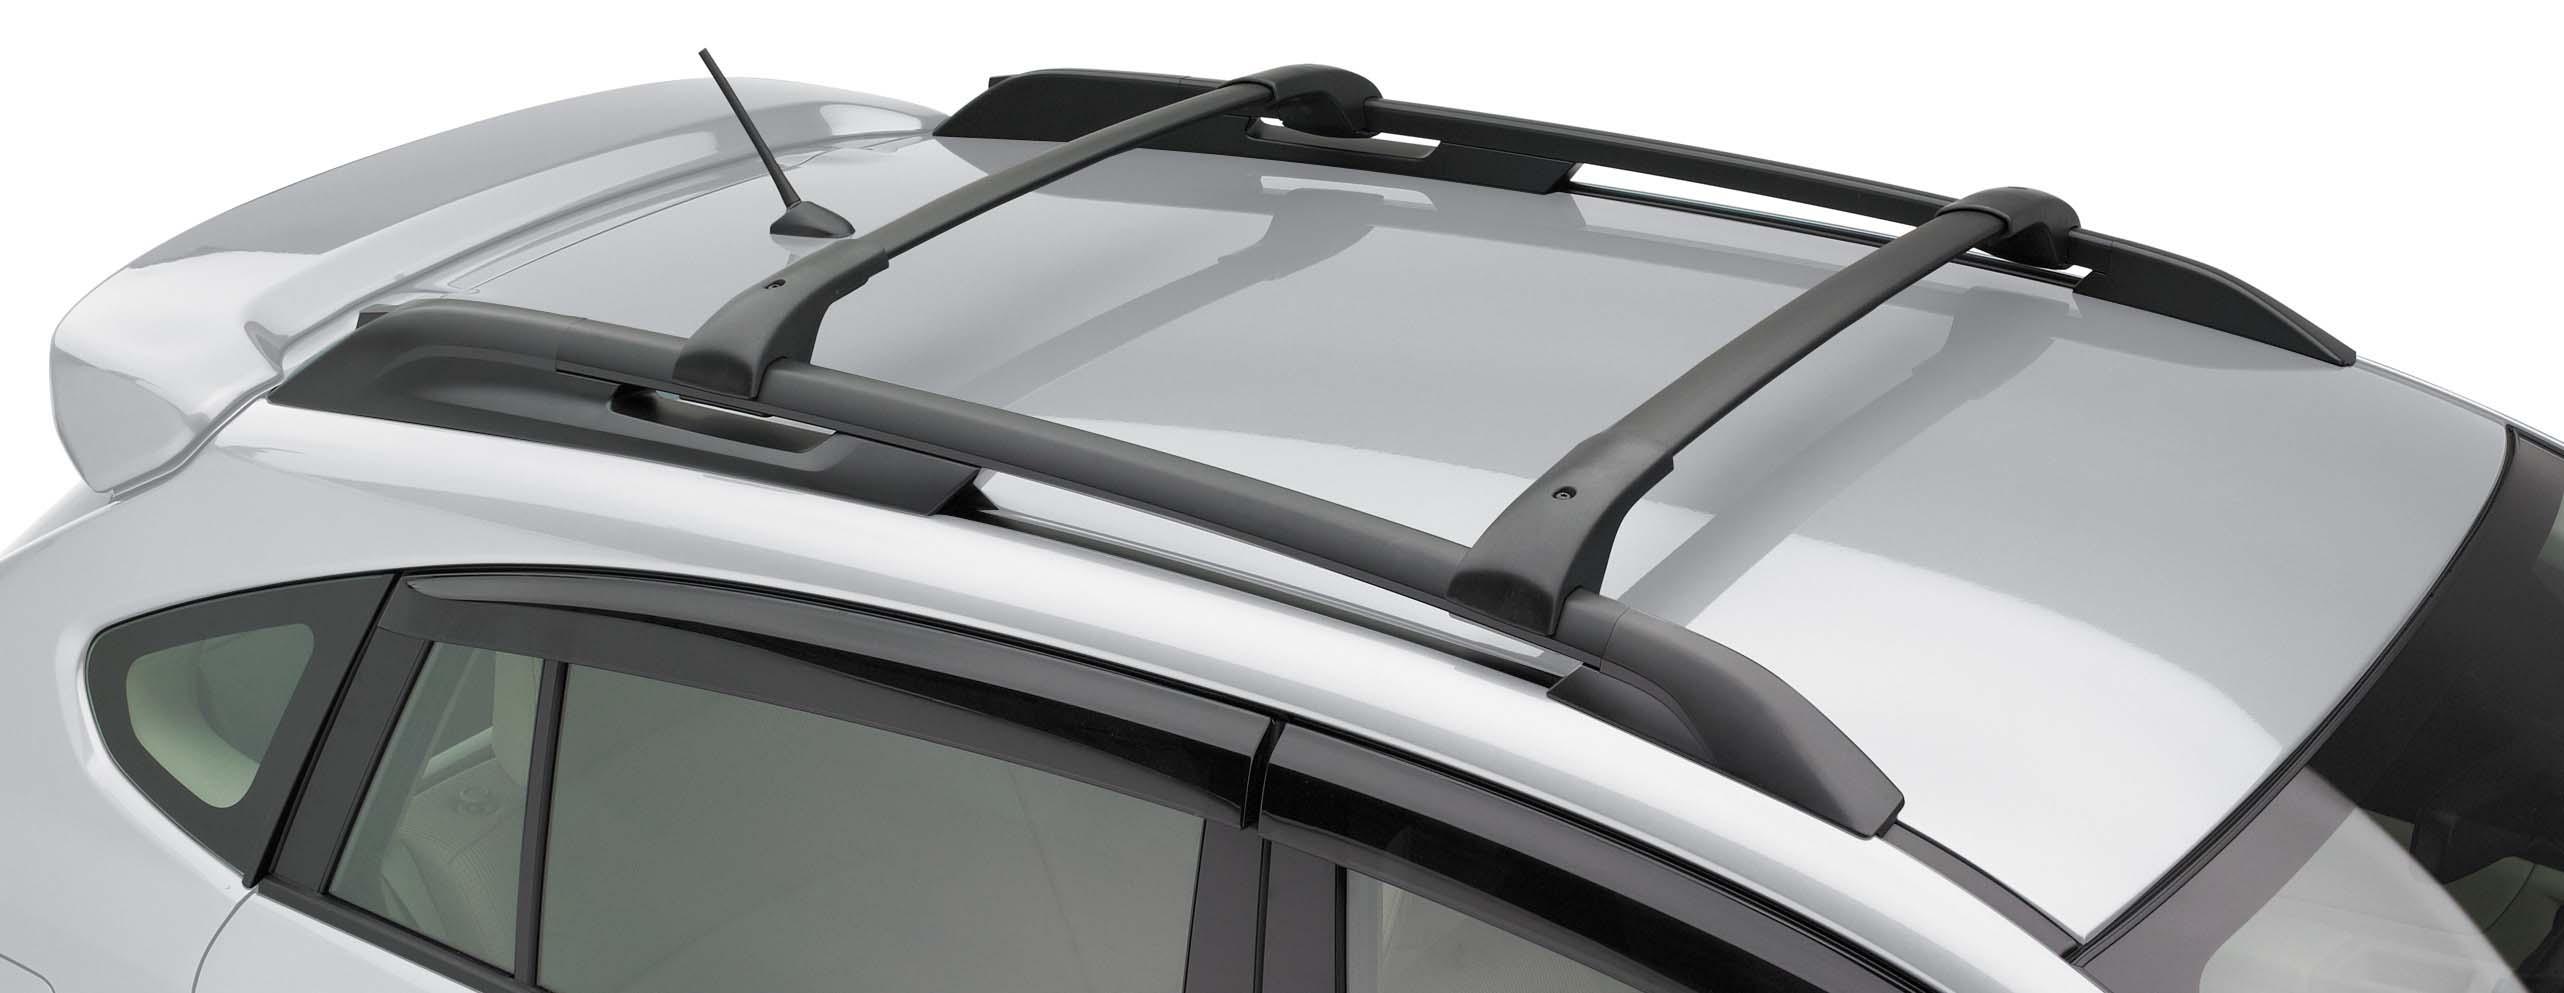 Subaru Crosstrek Cross Bar Aero Crossbar Set Adj Roof